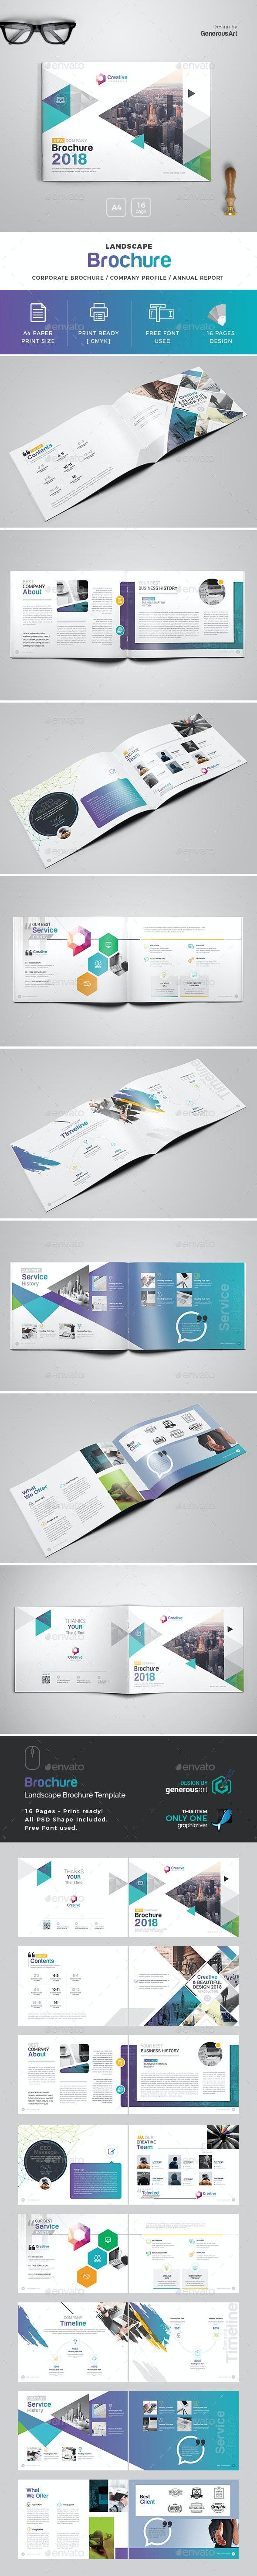 2018 Landscape Brochure Template - Brochures Print Templates